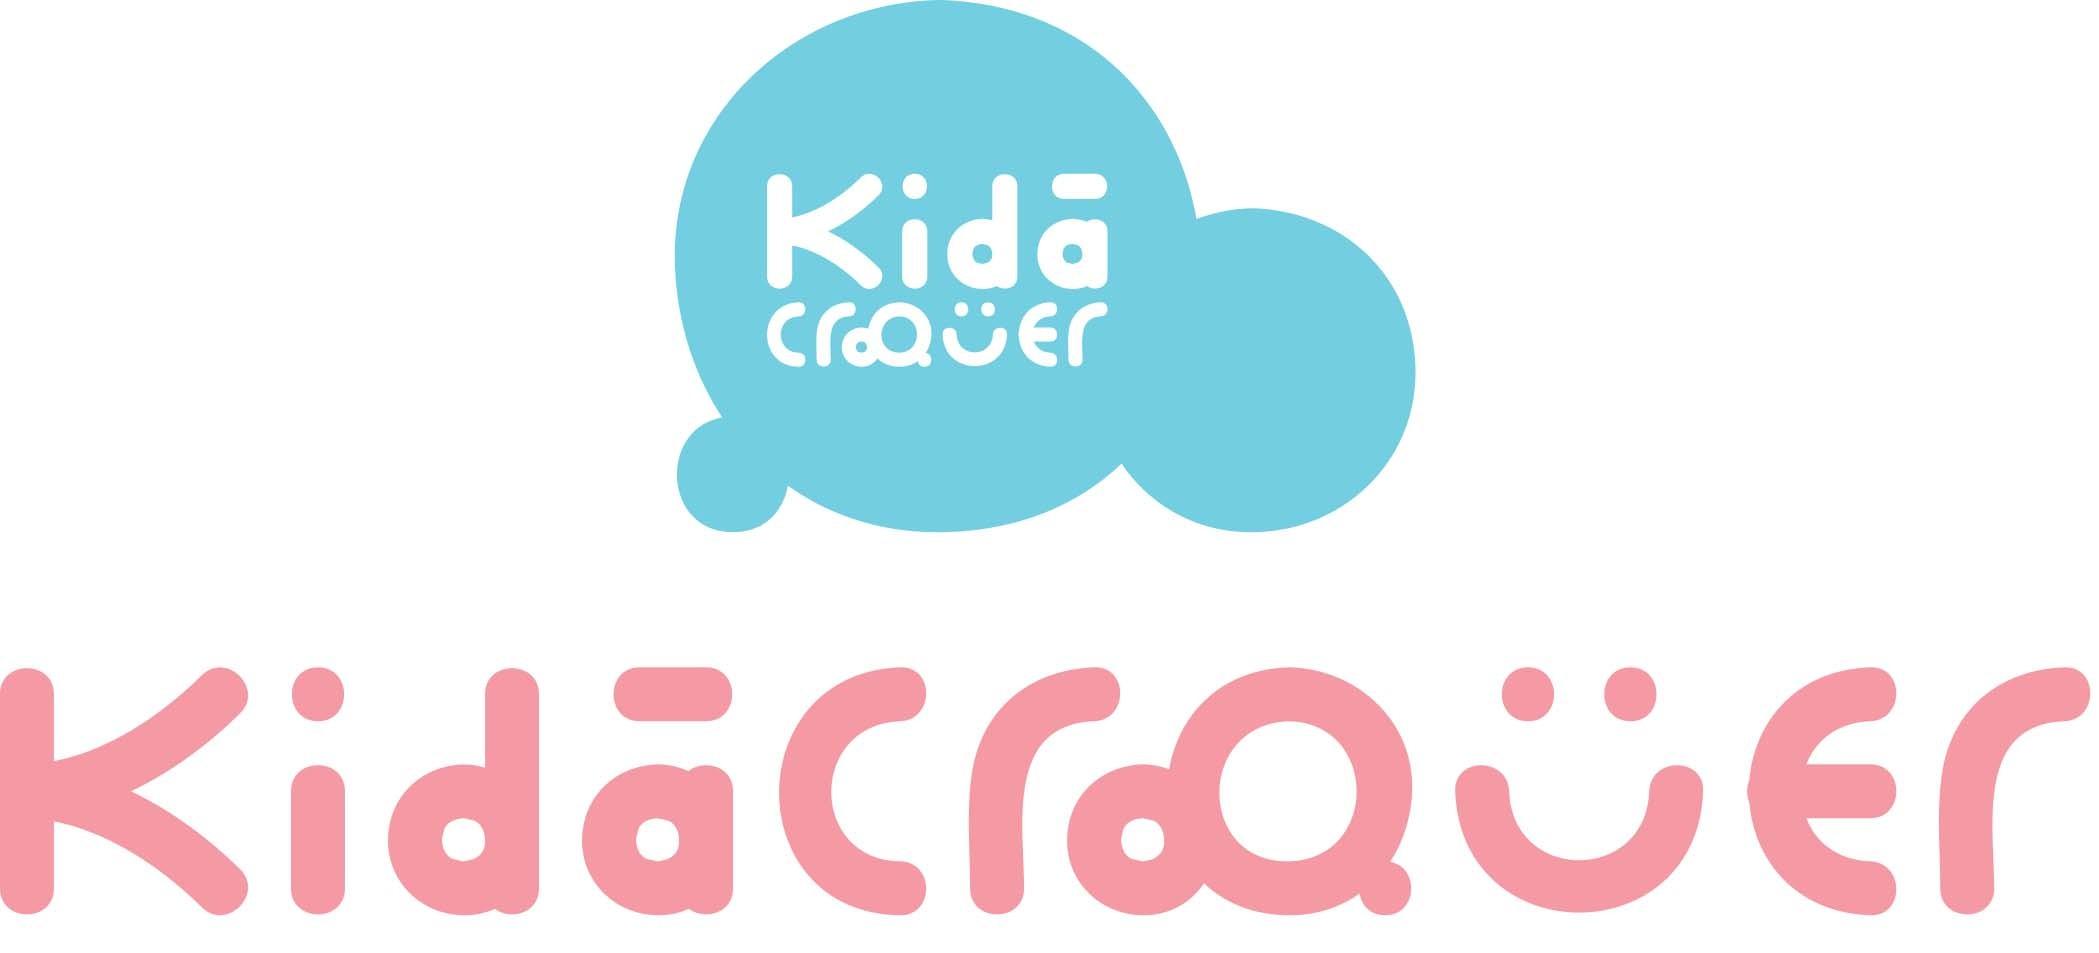 kidacroquer